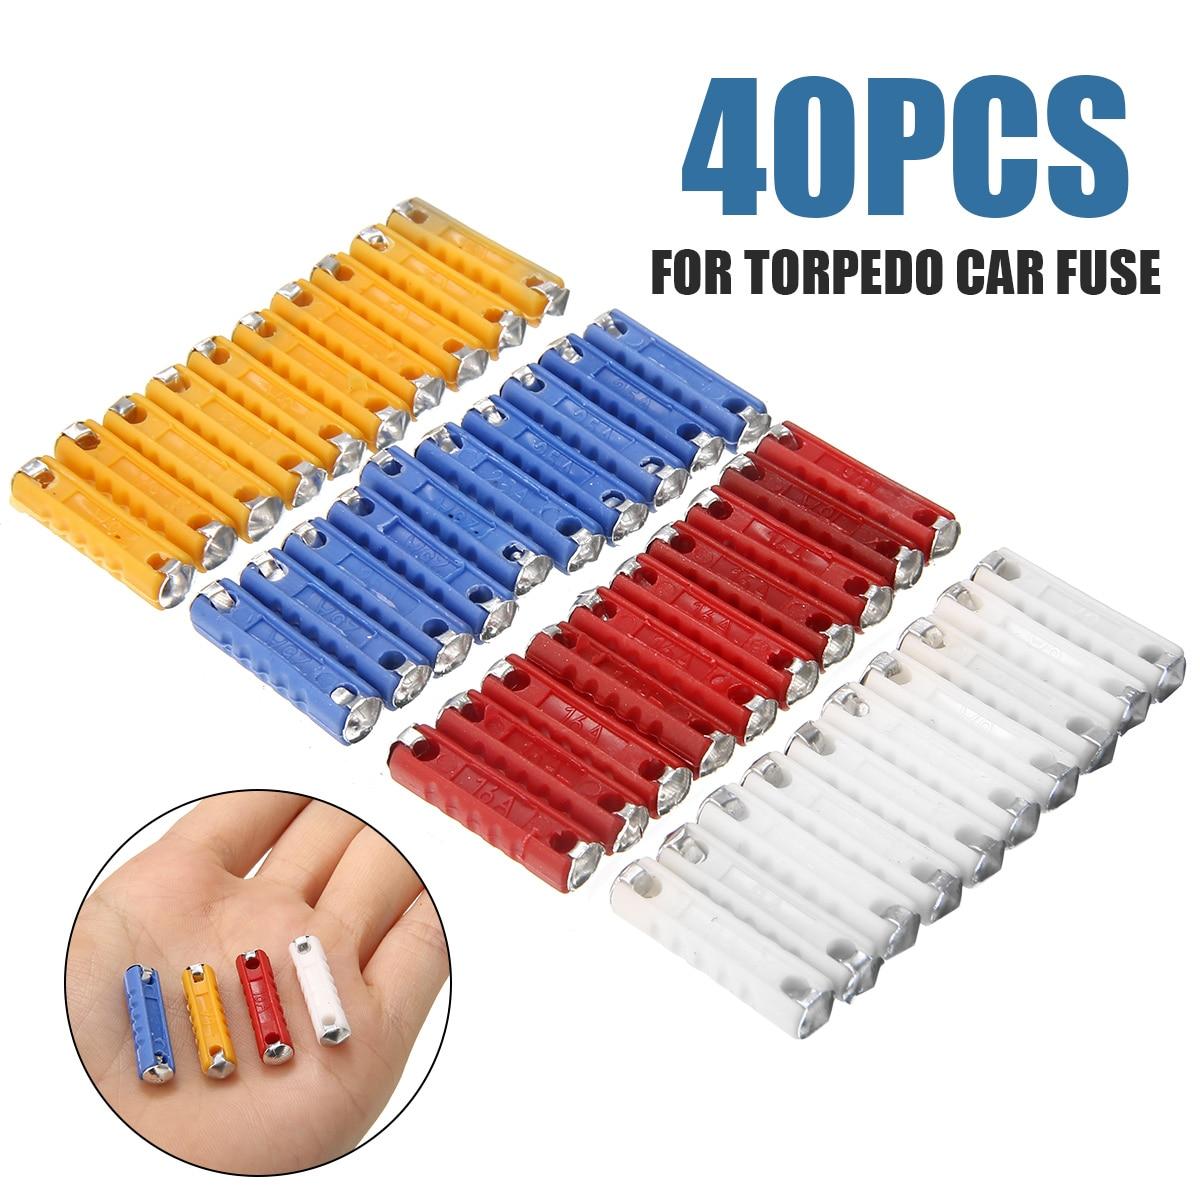 Kit surtido de fusibles de Torpedo 40 Uds 5Amp/8Amp/16Amp/25Amp Kit de fusibles de cerámica Continental para coche con forma de Torpedo Bullet Classic